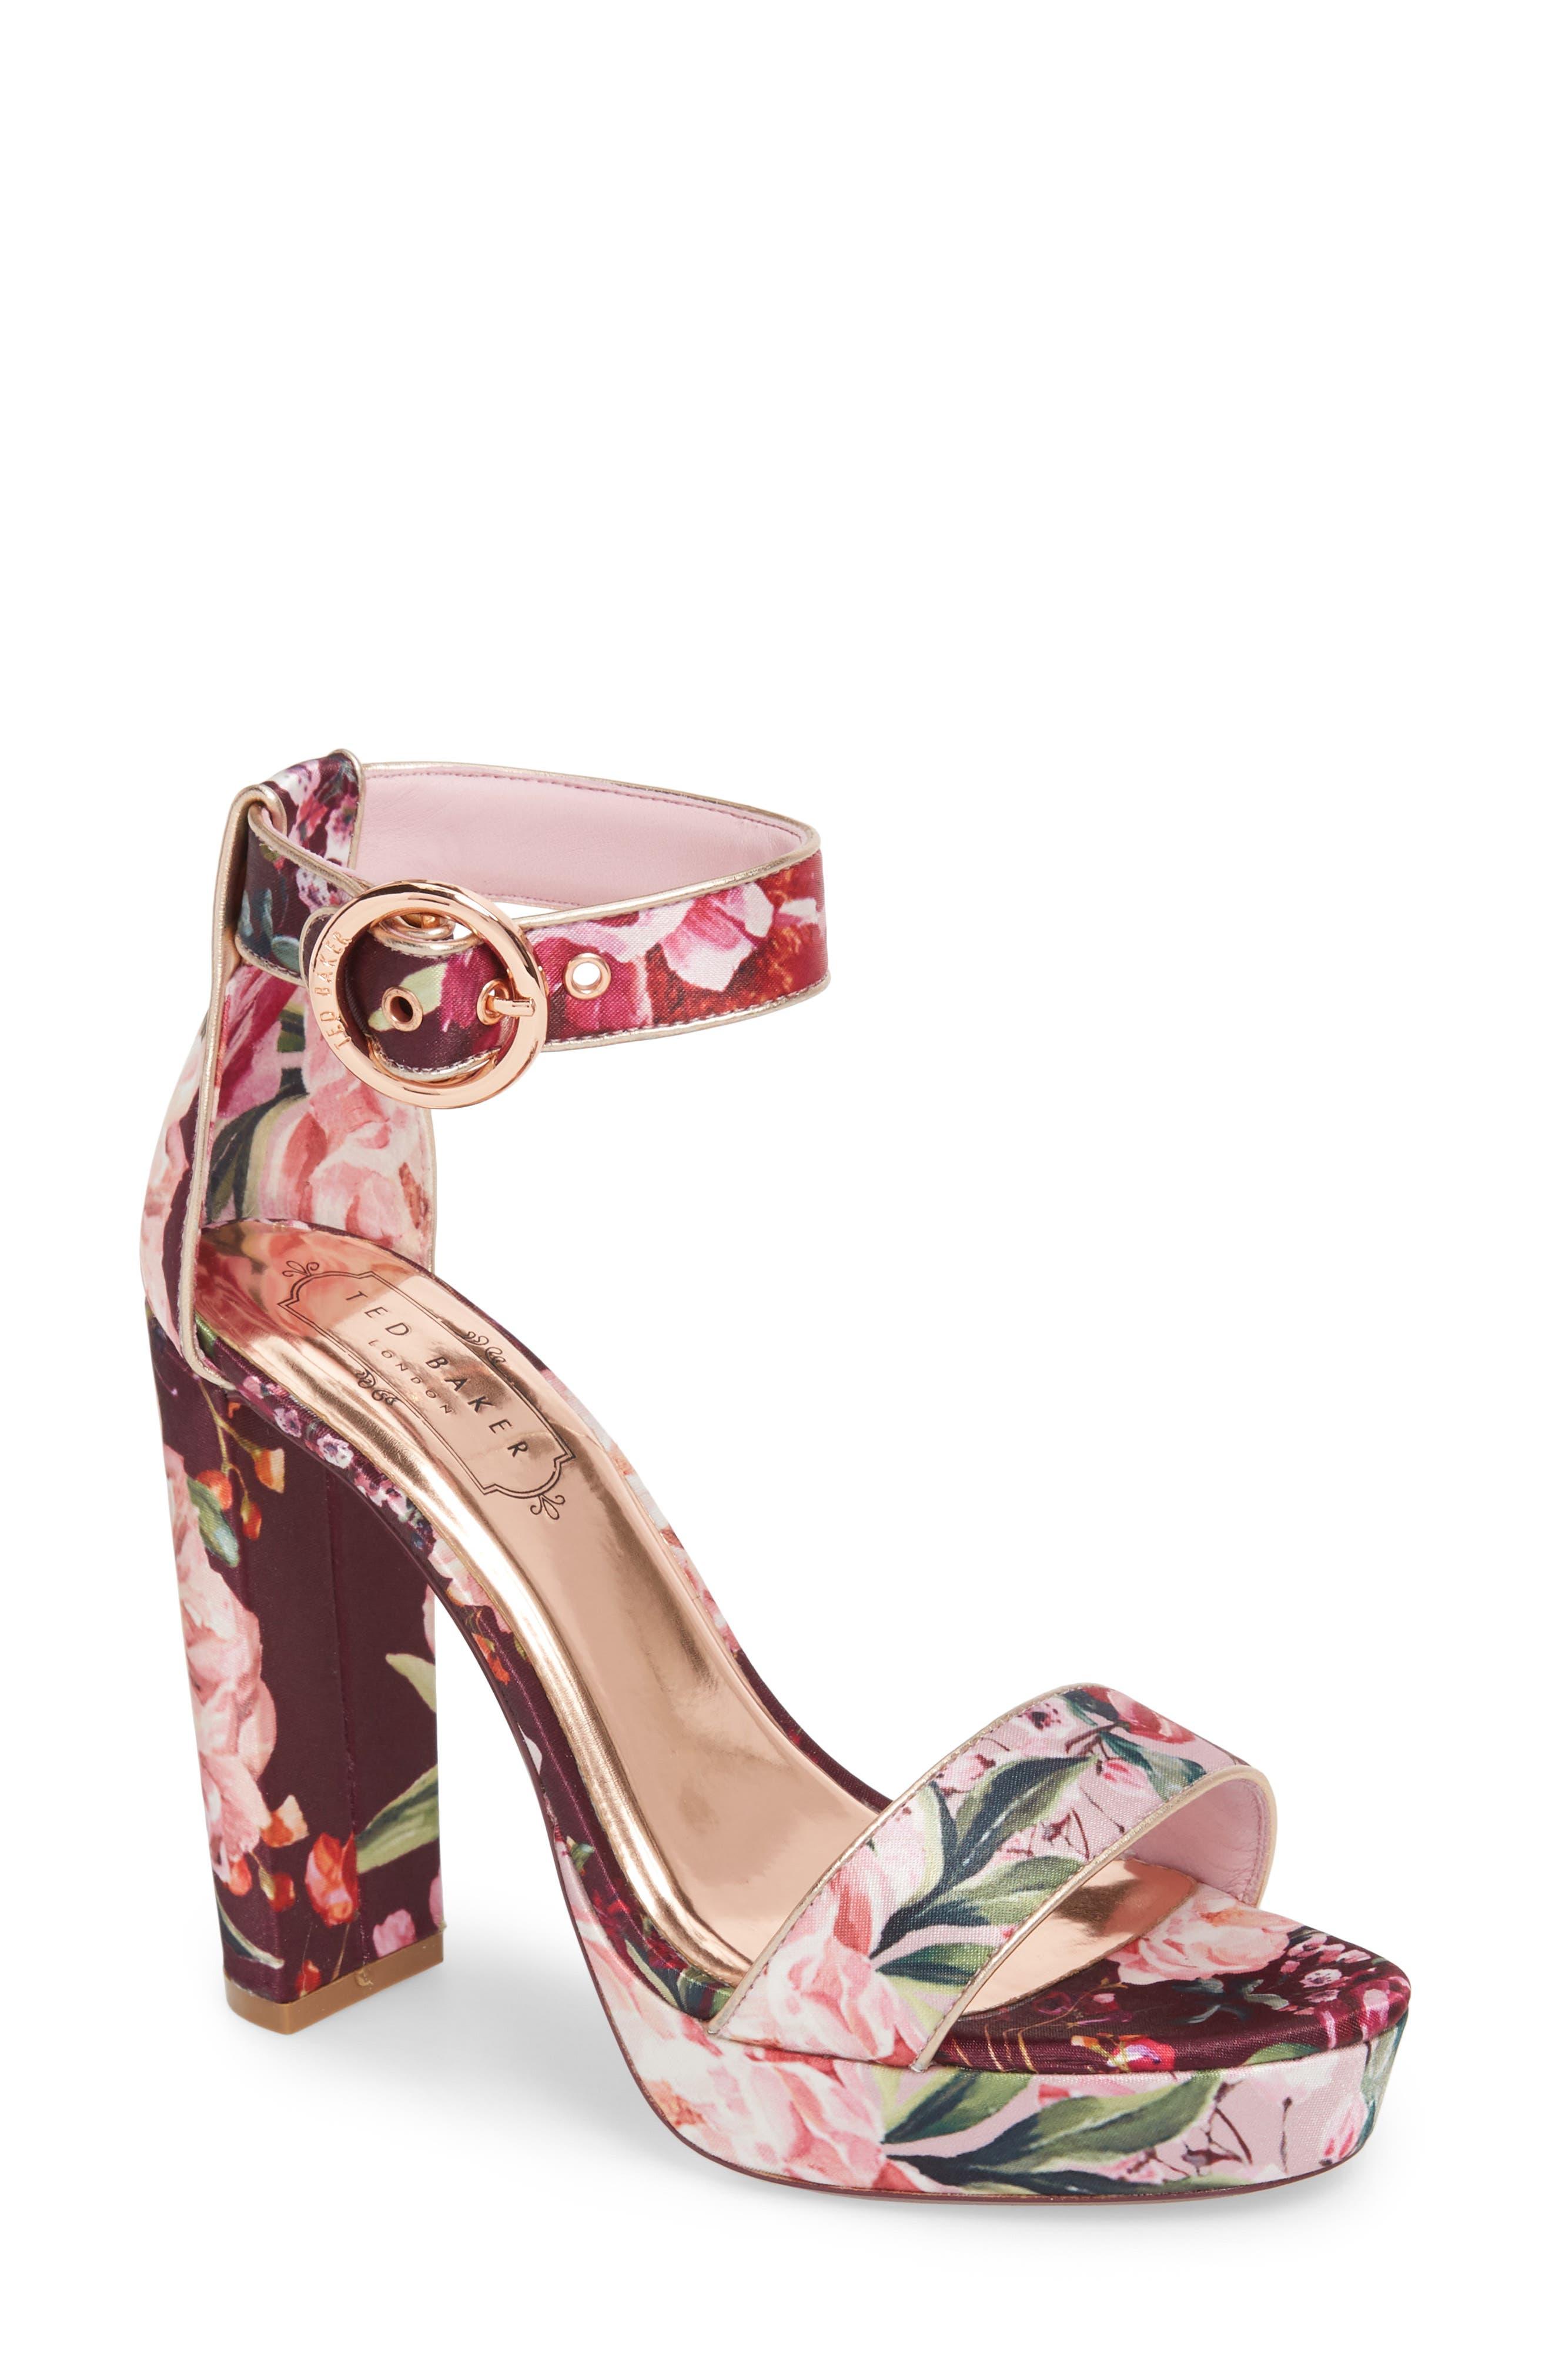 Jewll Ankle Strap Sandal,                             Main thumbnail 1, color,                             Serenity Satin